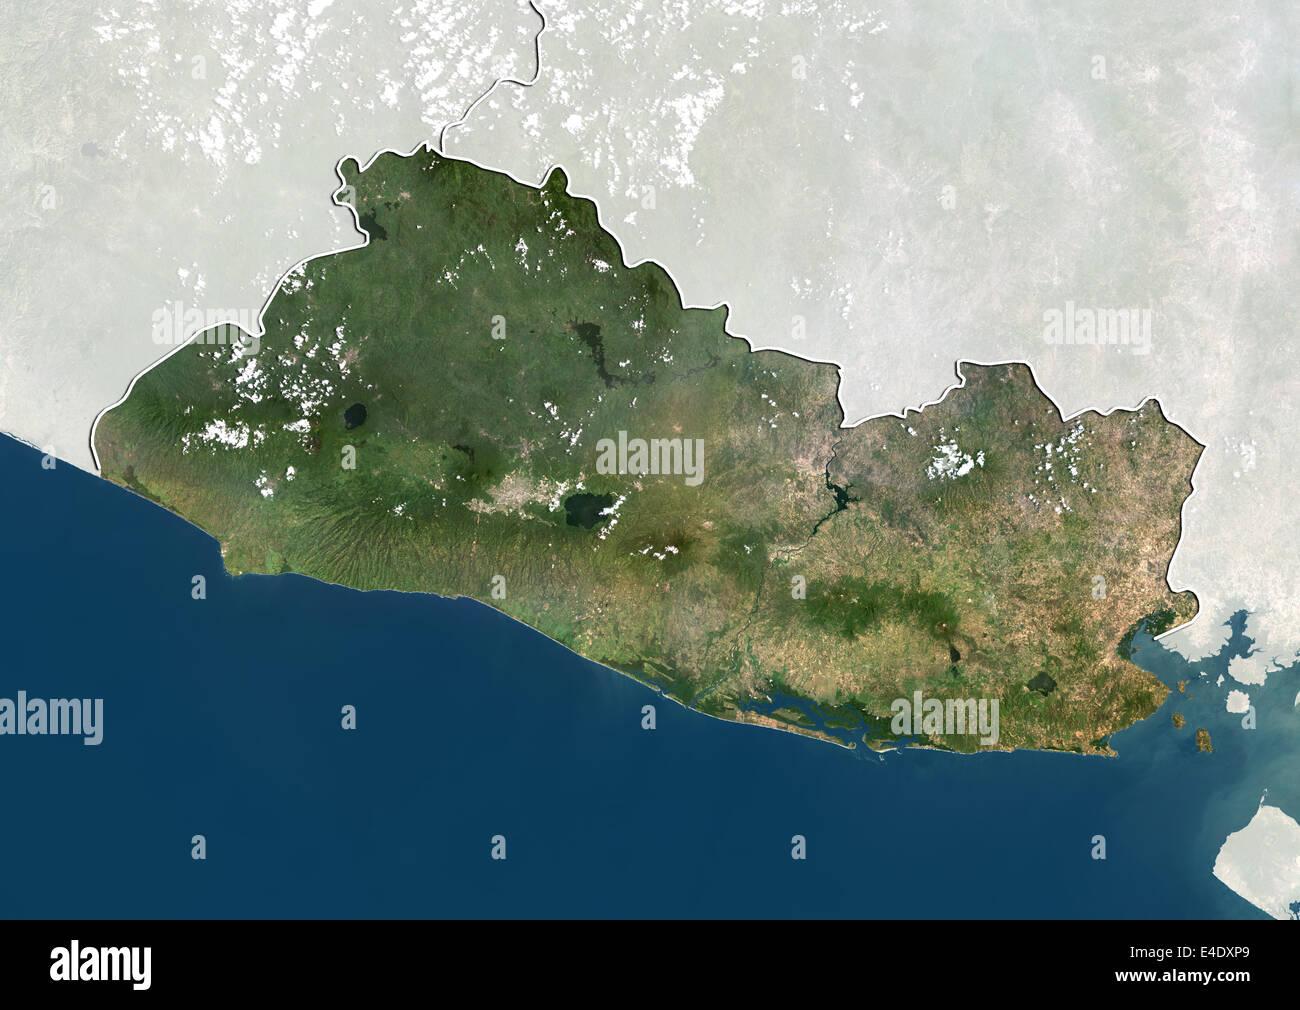 El Salvador True Colour Satellite Image With Border And Mask - Satellite image photo of el salvador